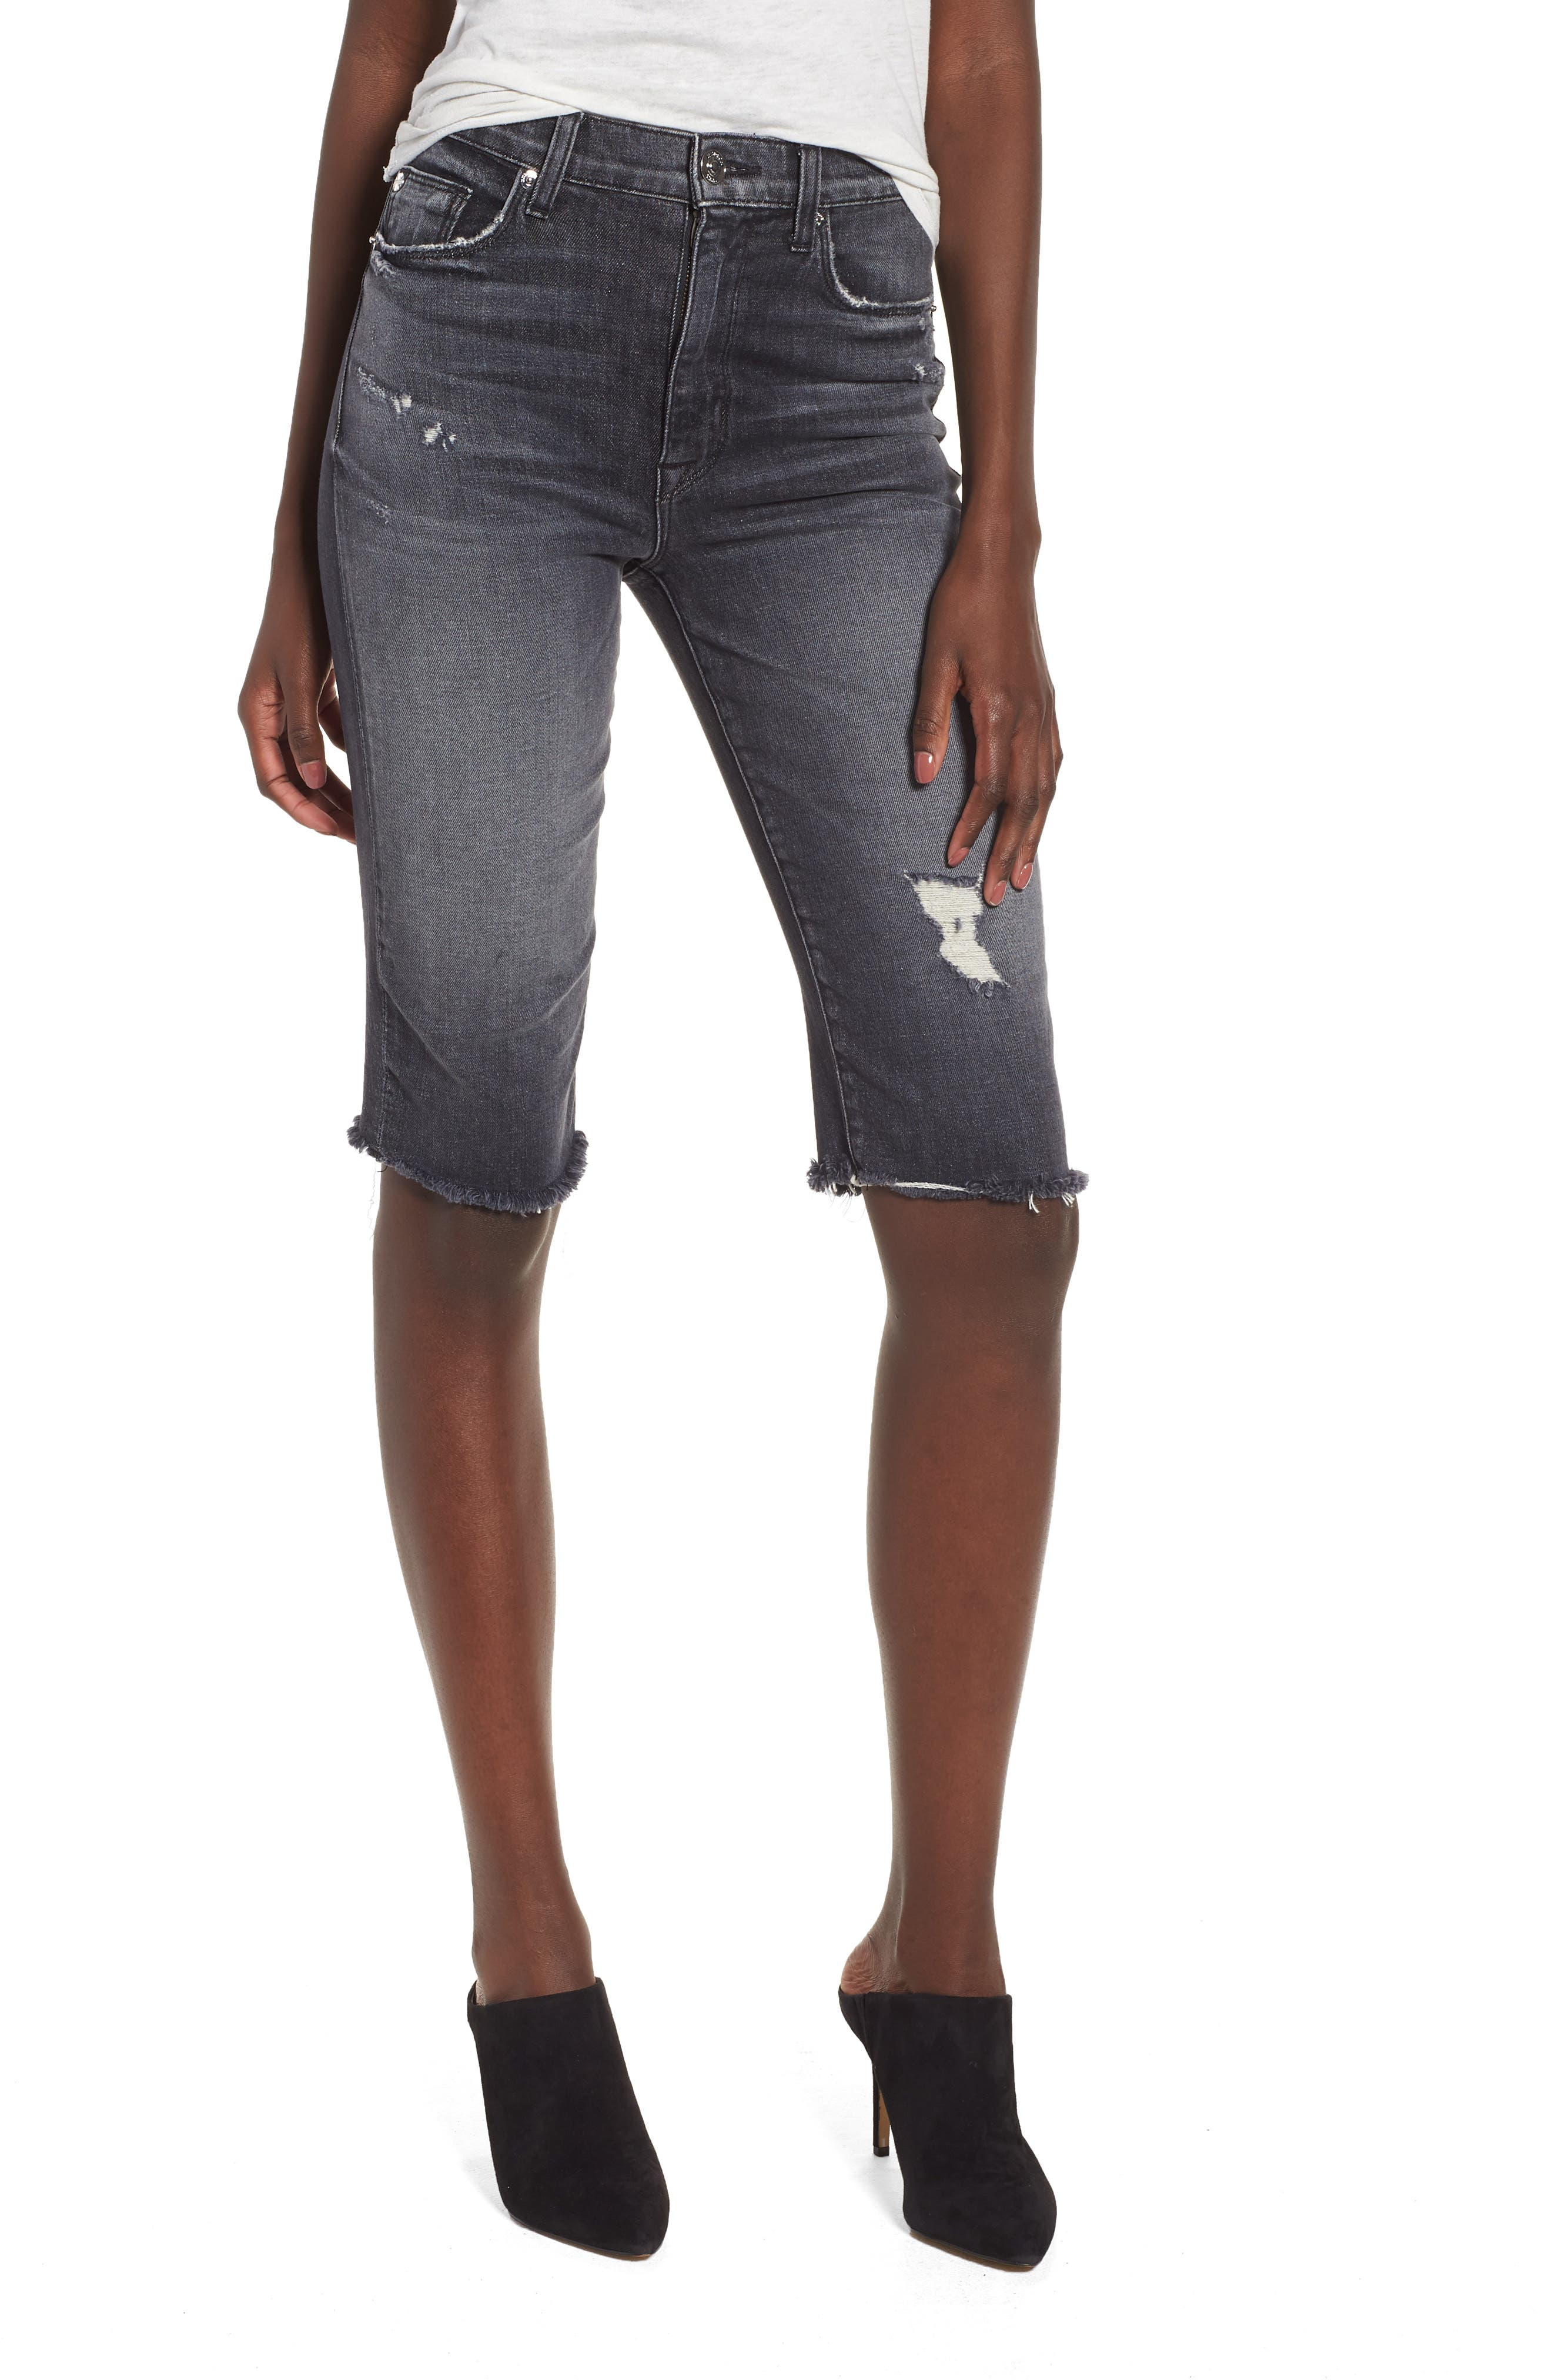 Alternate Image 1 Selected - Hudson Jeans Zoeey High Waist Cutoff Boyfriend Shorts (Malice)